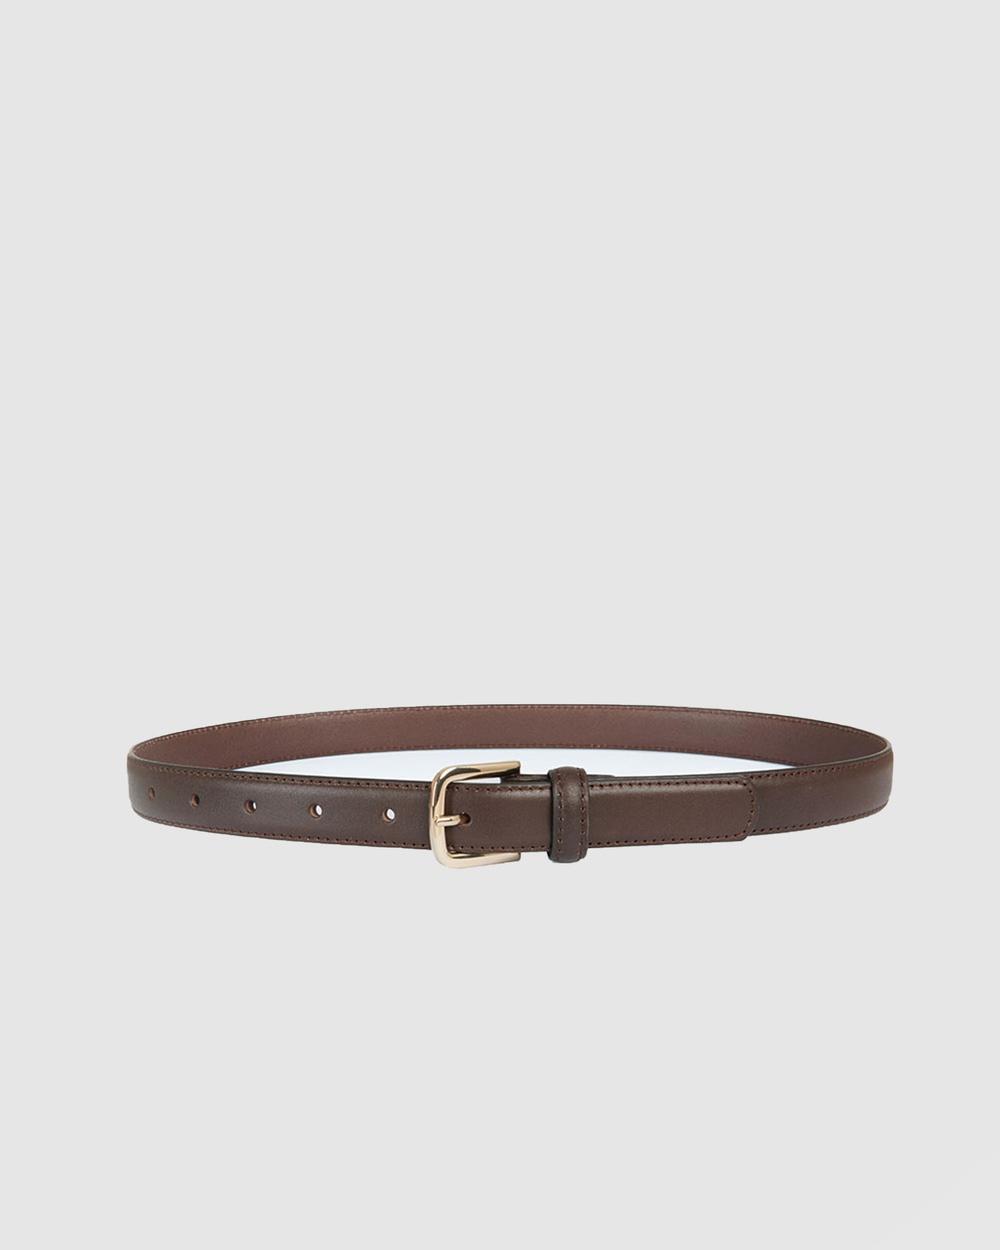 Forcast Sofia Leather Belt Belts Chocolate